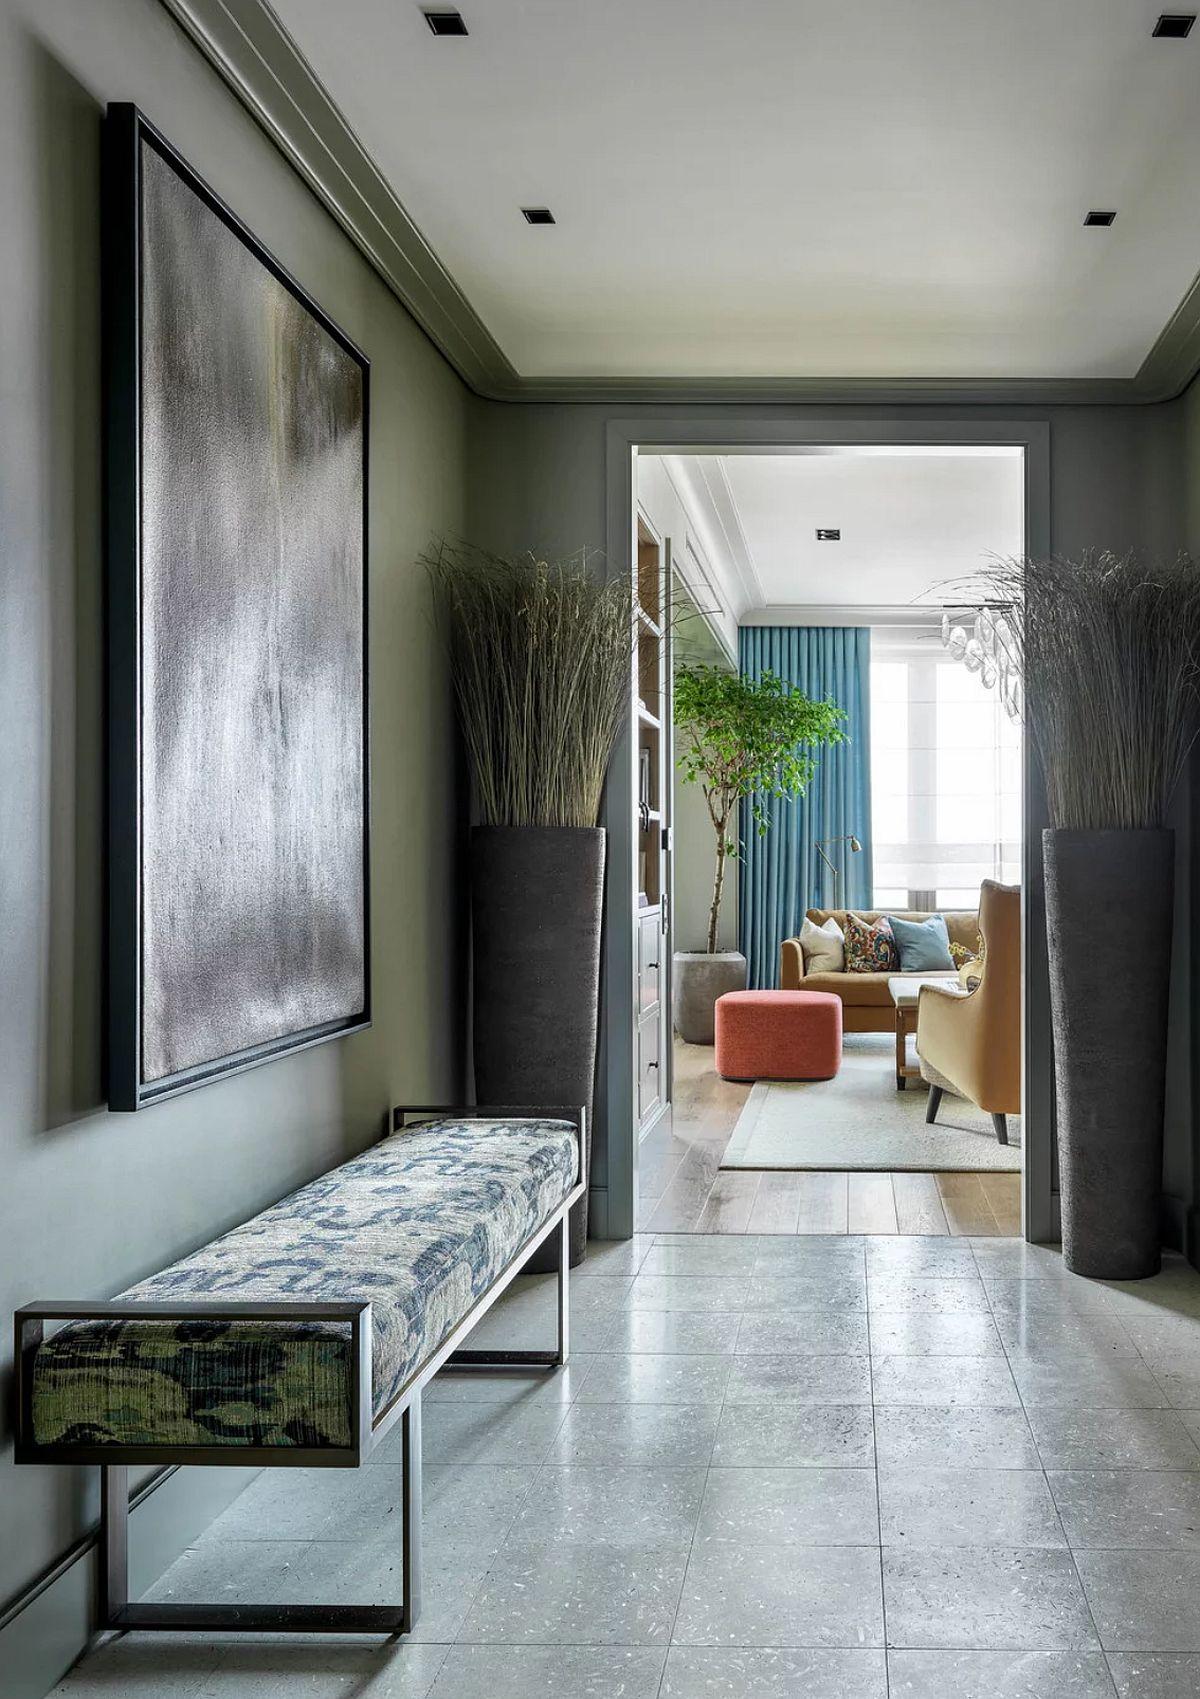 adelaparvu.com despre apartament 196 mp, designer Anna Pavlovskaya, Foto Serghei Krasyuk (11)